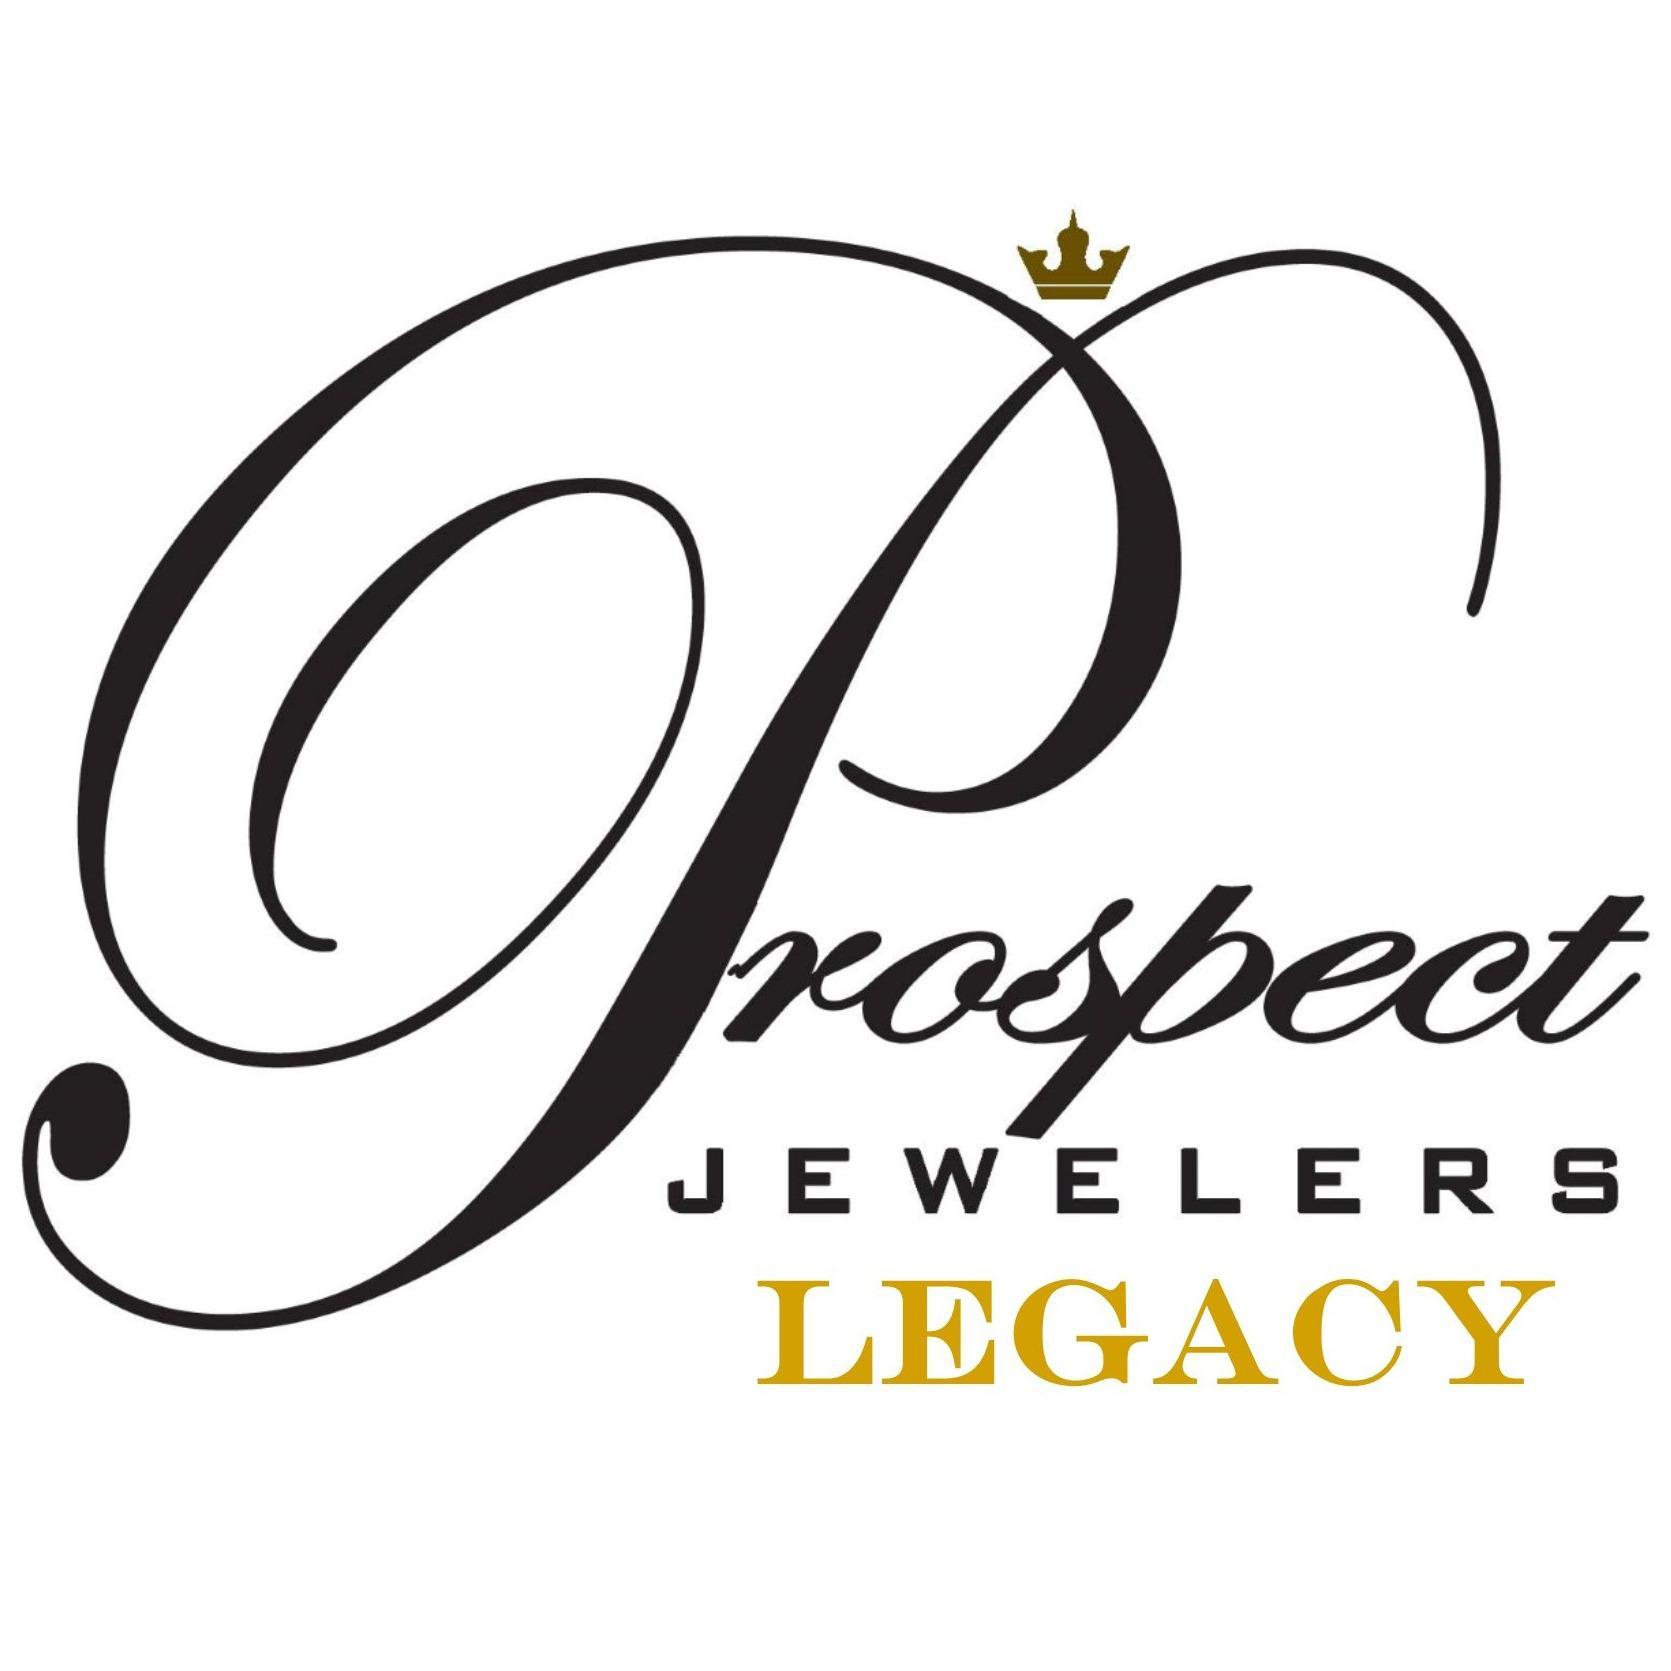 Prospect Jewelers Legacy image 16